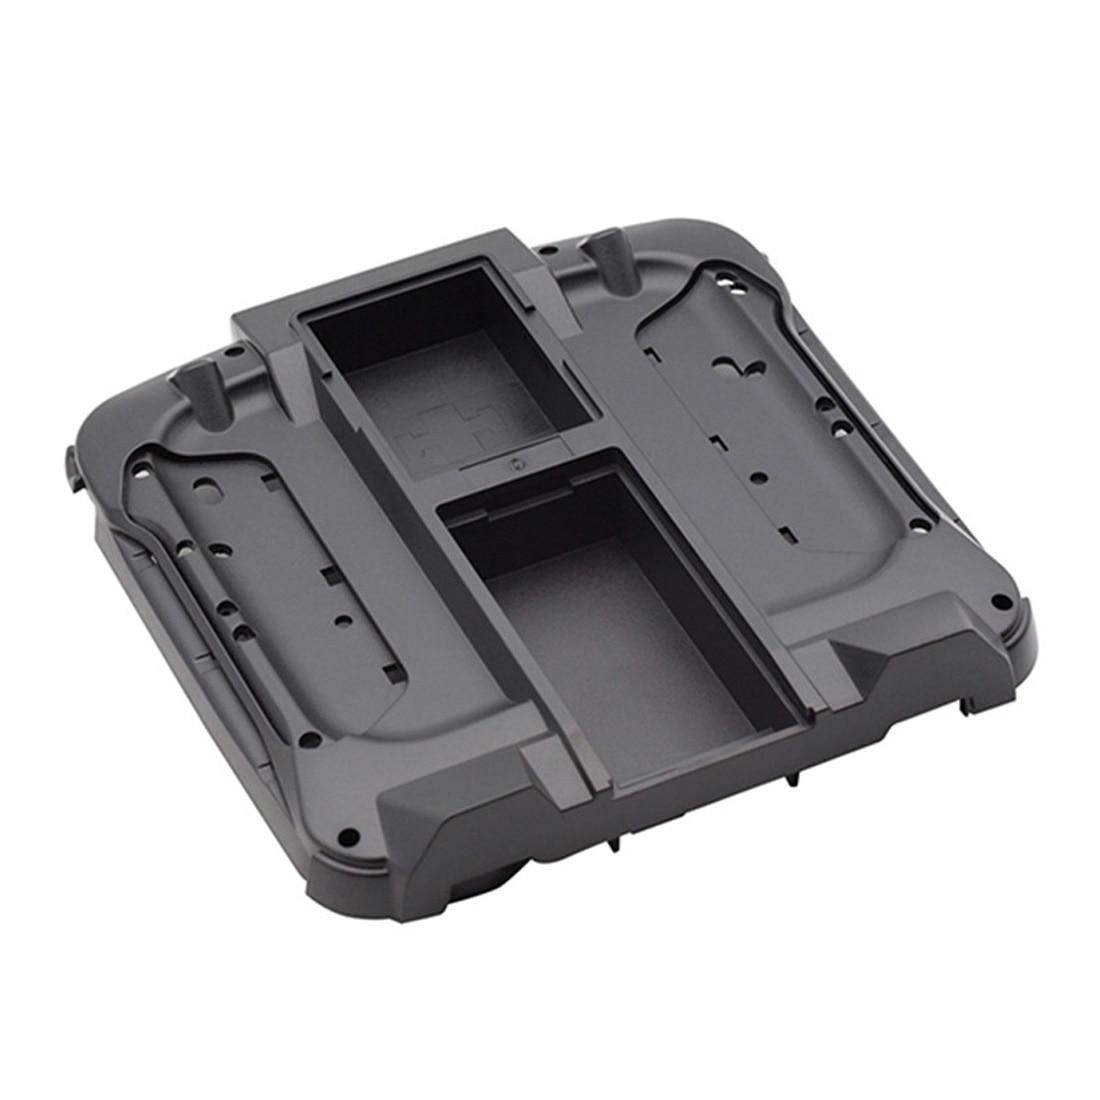 Jumper T16 Задняя панель для T16/T16 Pro Hall Series передатчик Радиоконтроллер TX